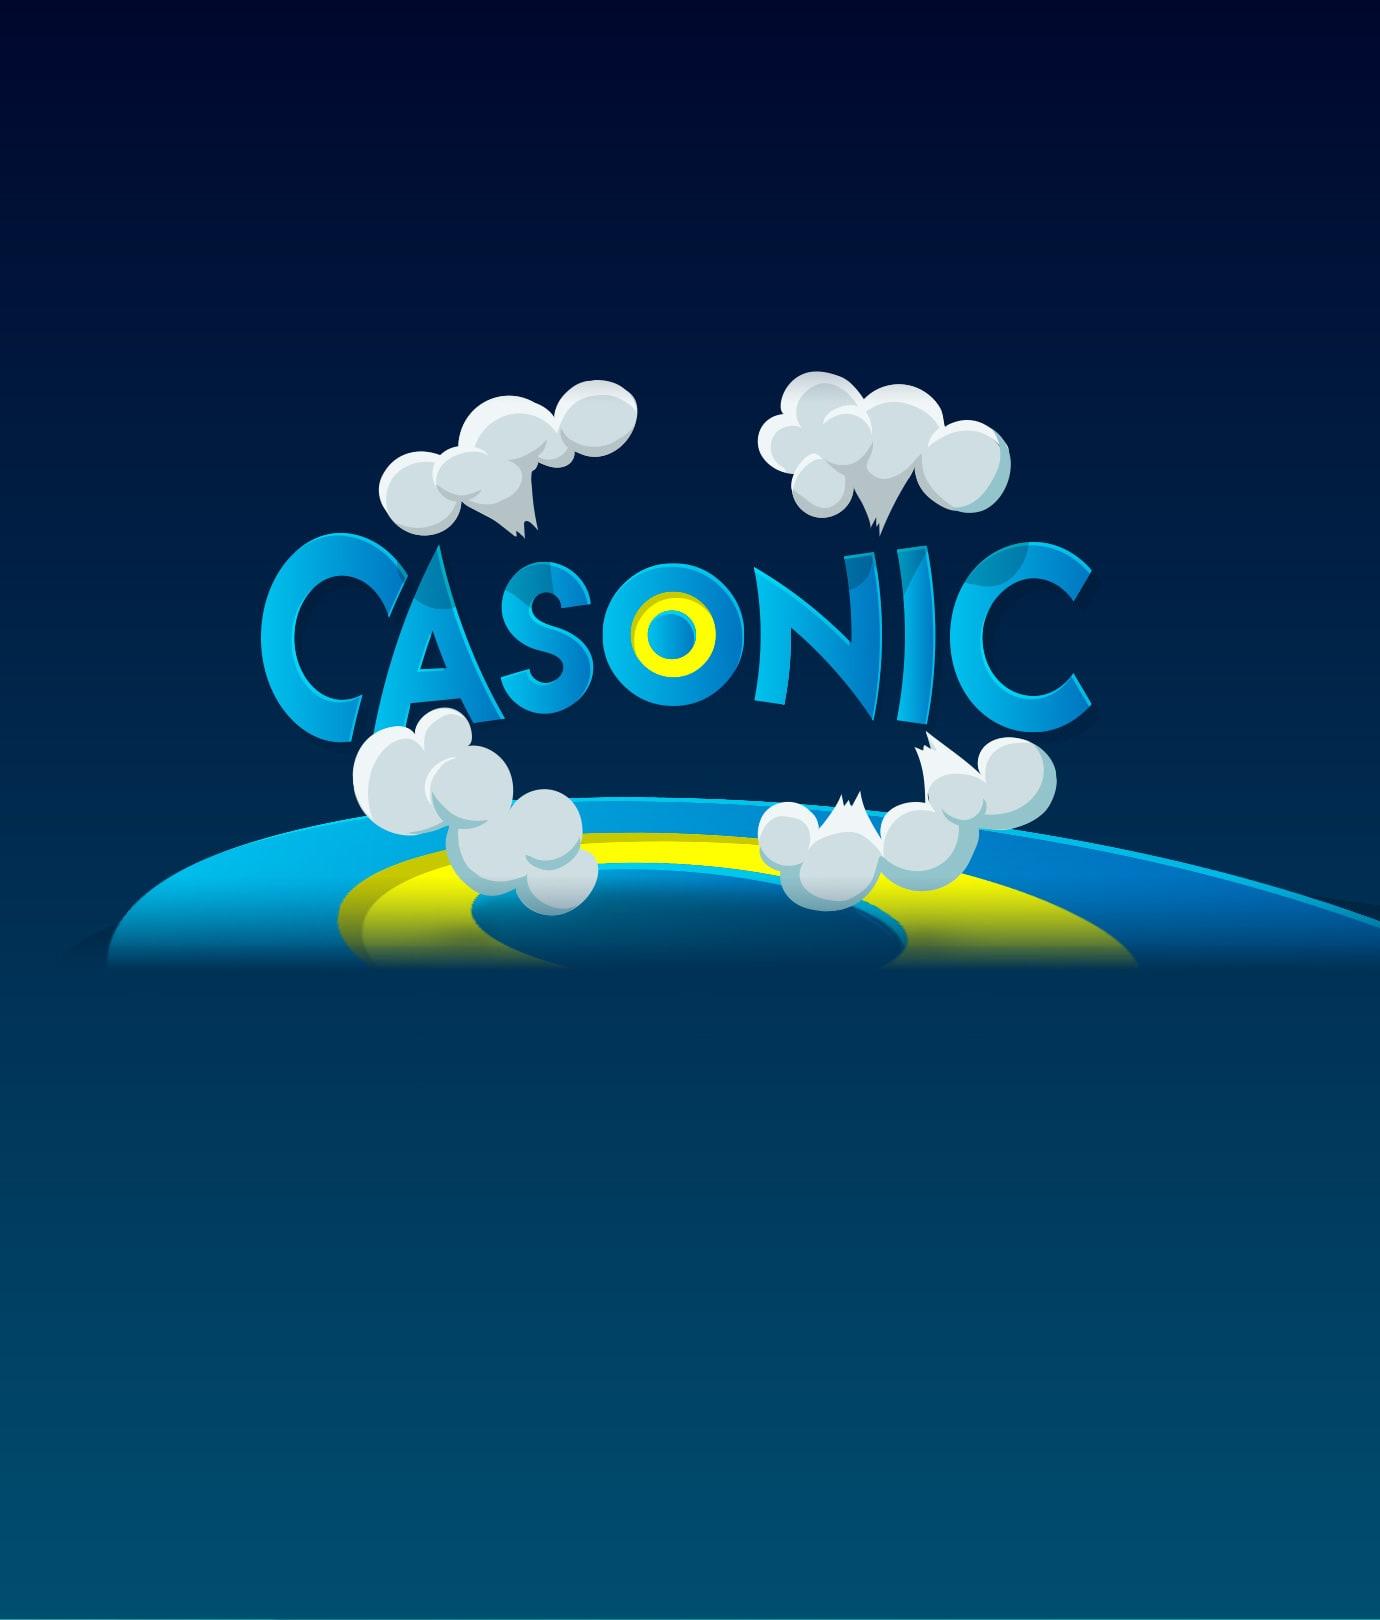 Casonic image